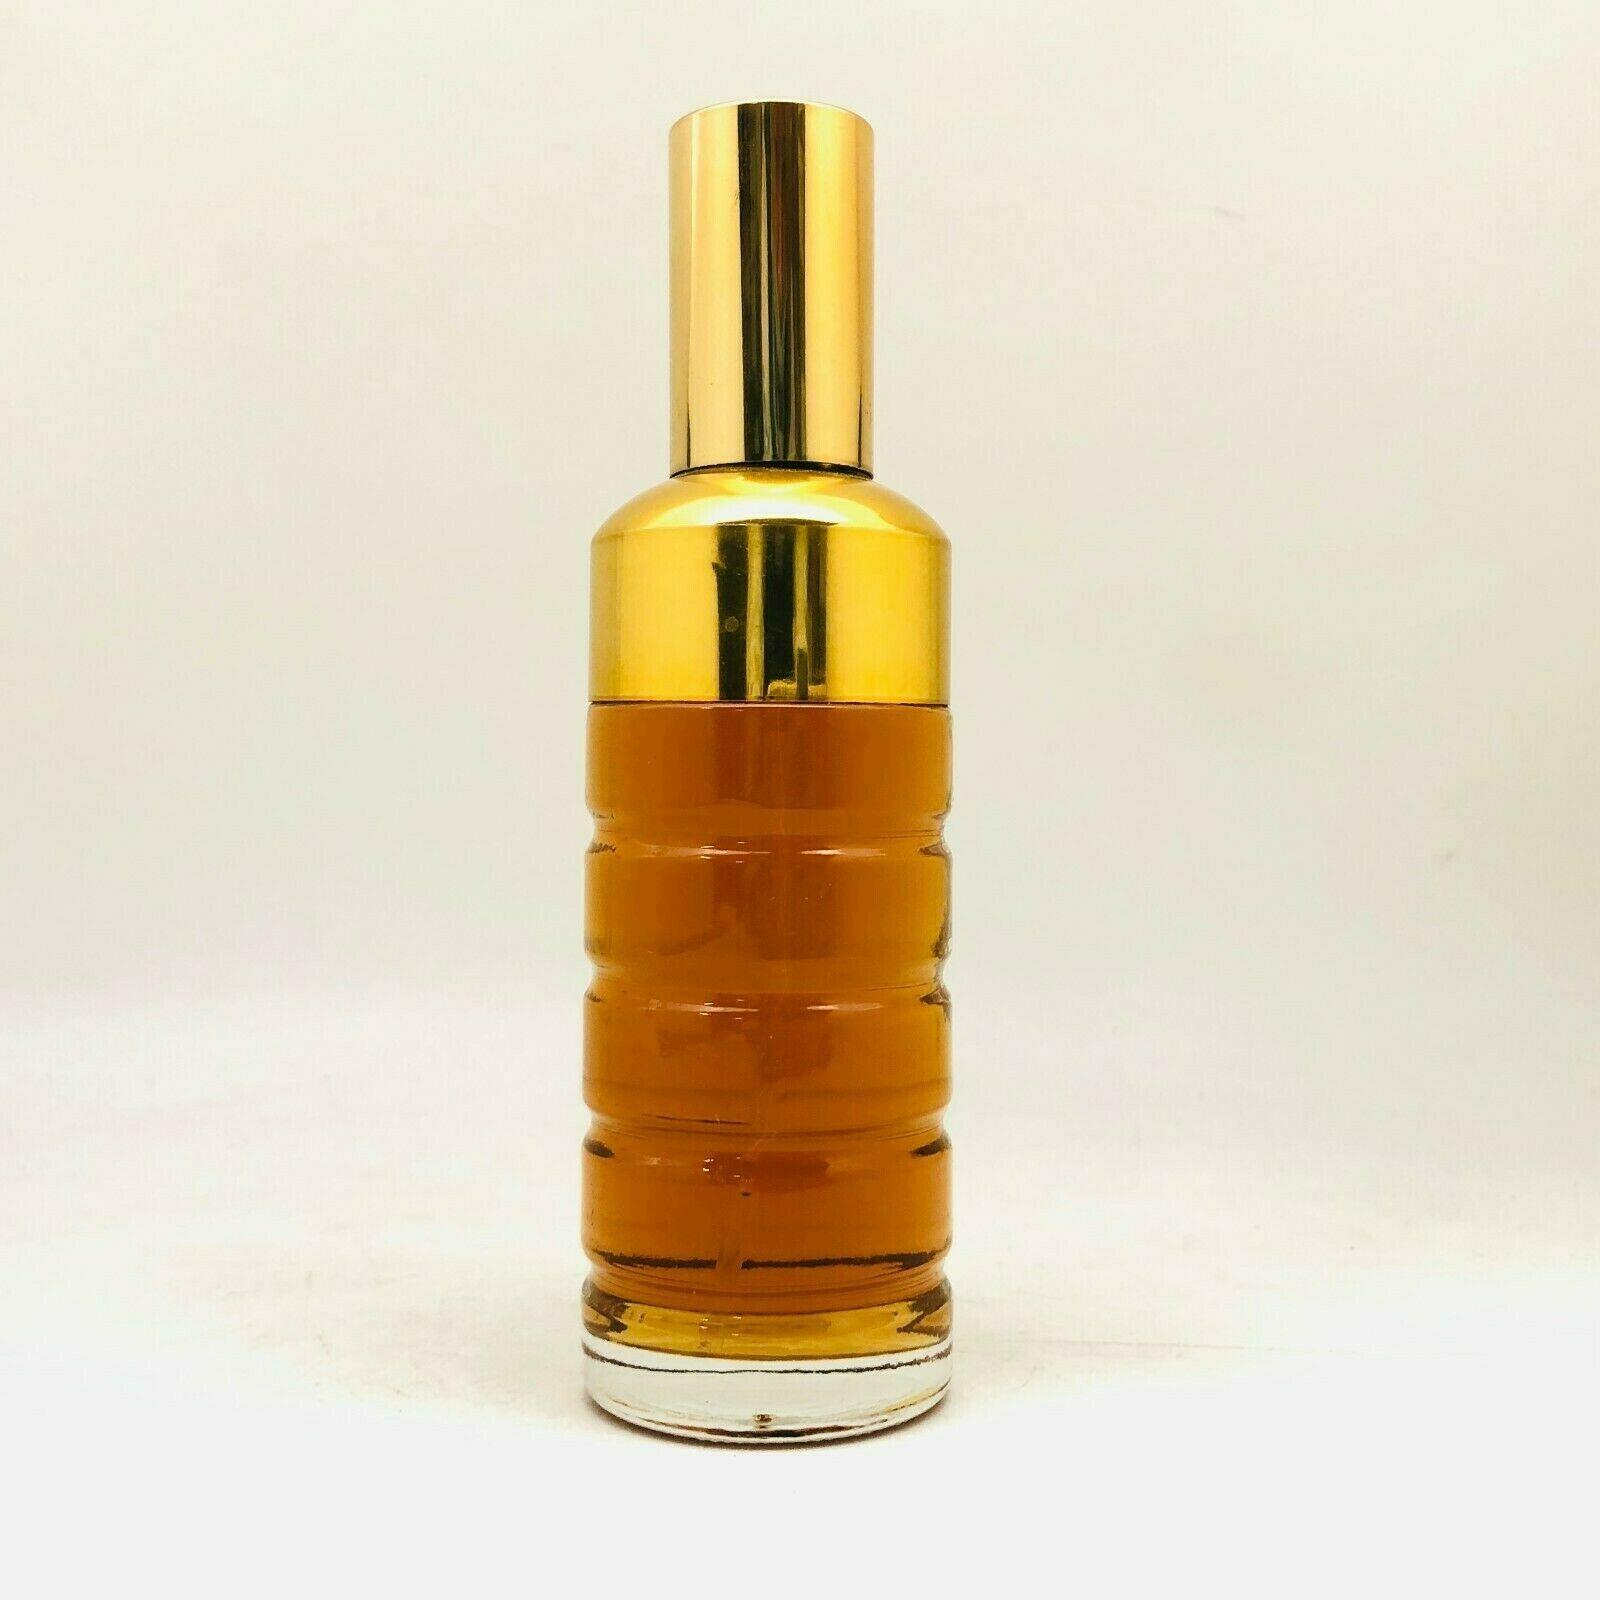 Aaaaaaestee lauder azuree unboxed perfume